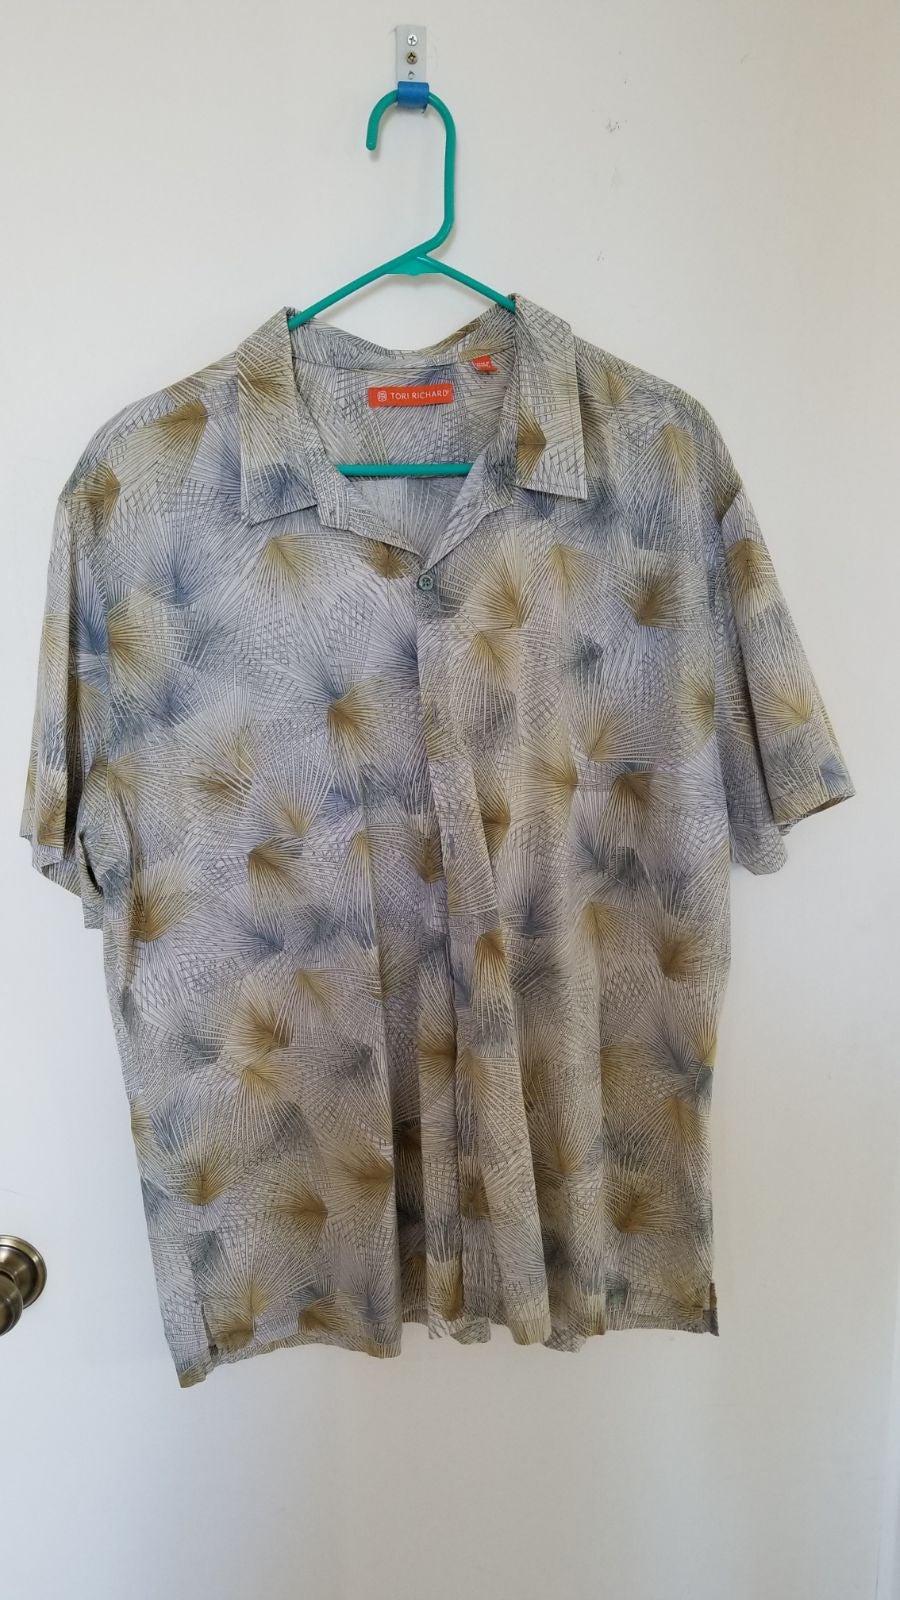 Tori Richard men's Aloha Shirt